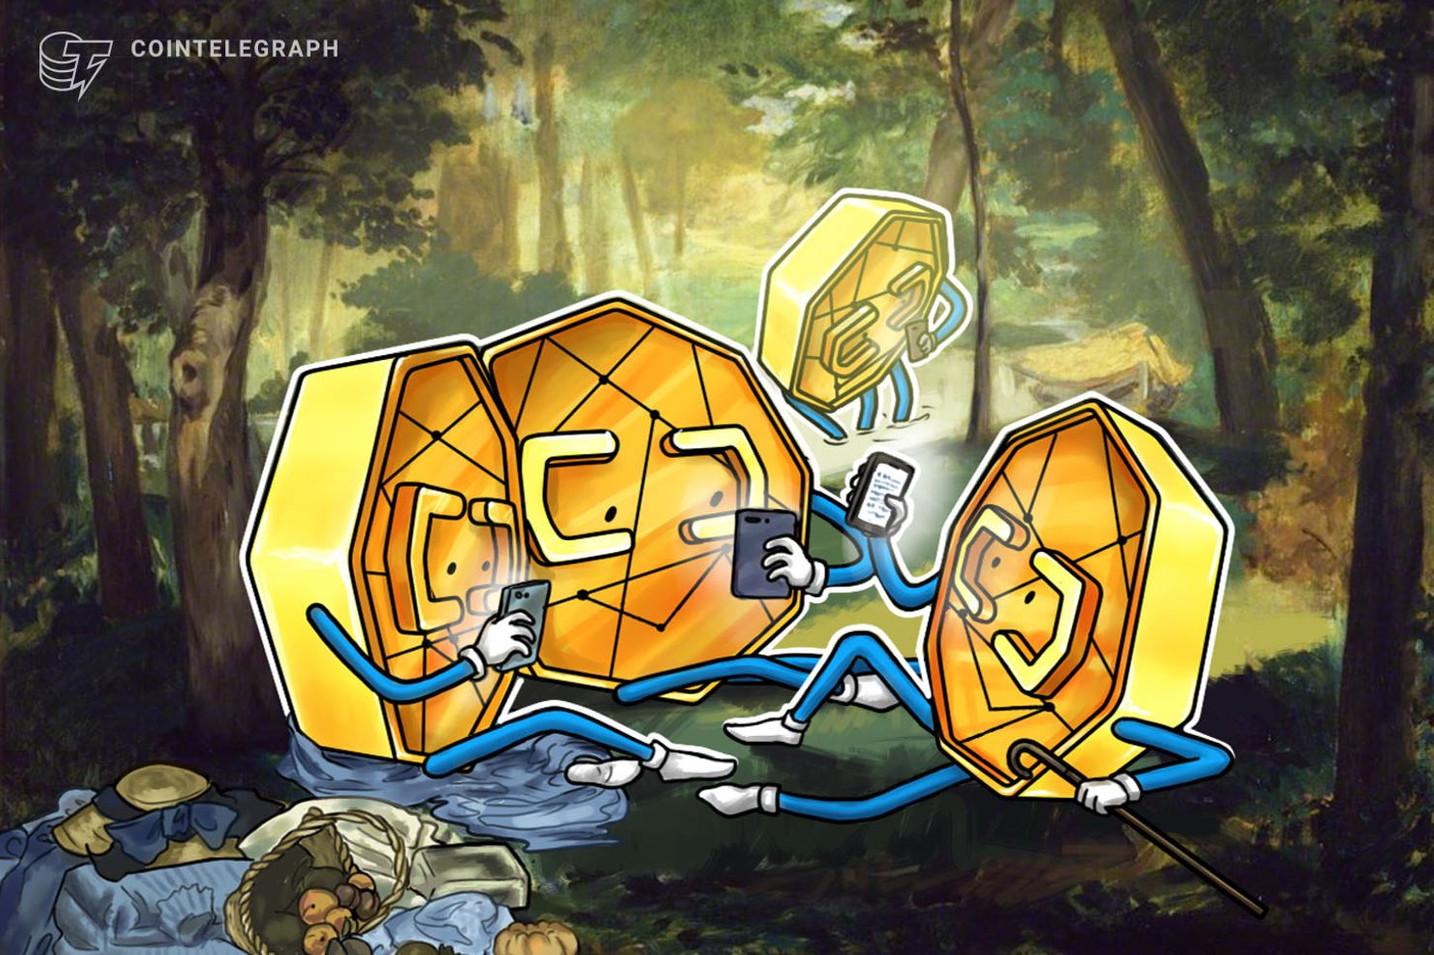 Block.One CEO、「EOSのエコシステム強化へ」仮想通貨市場の未来語る【アラート】